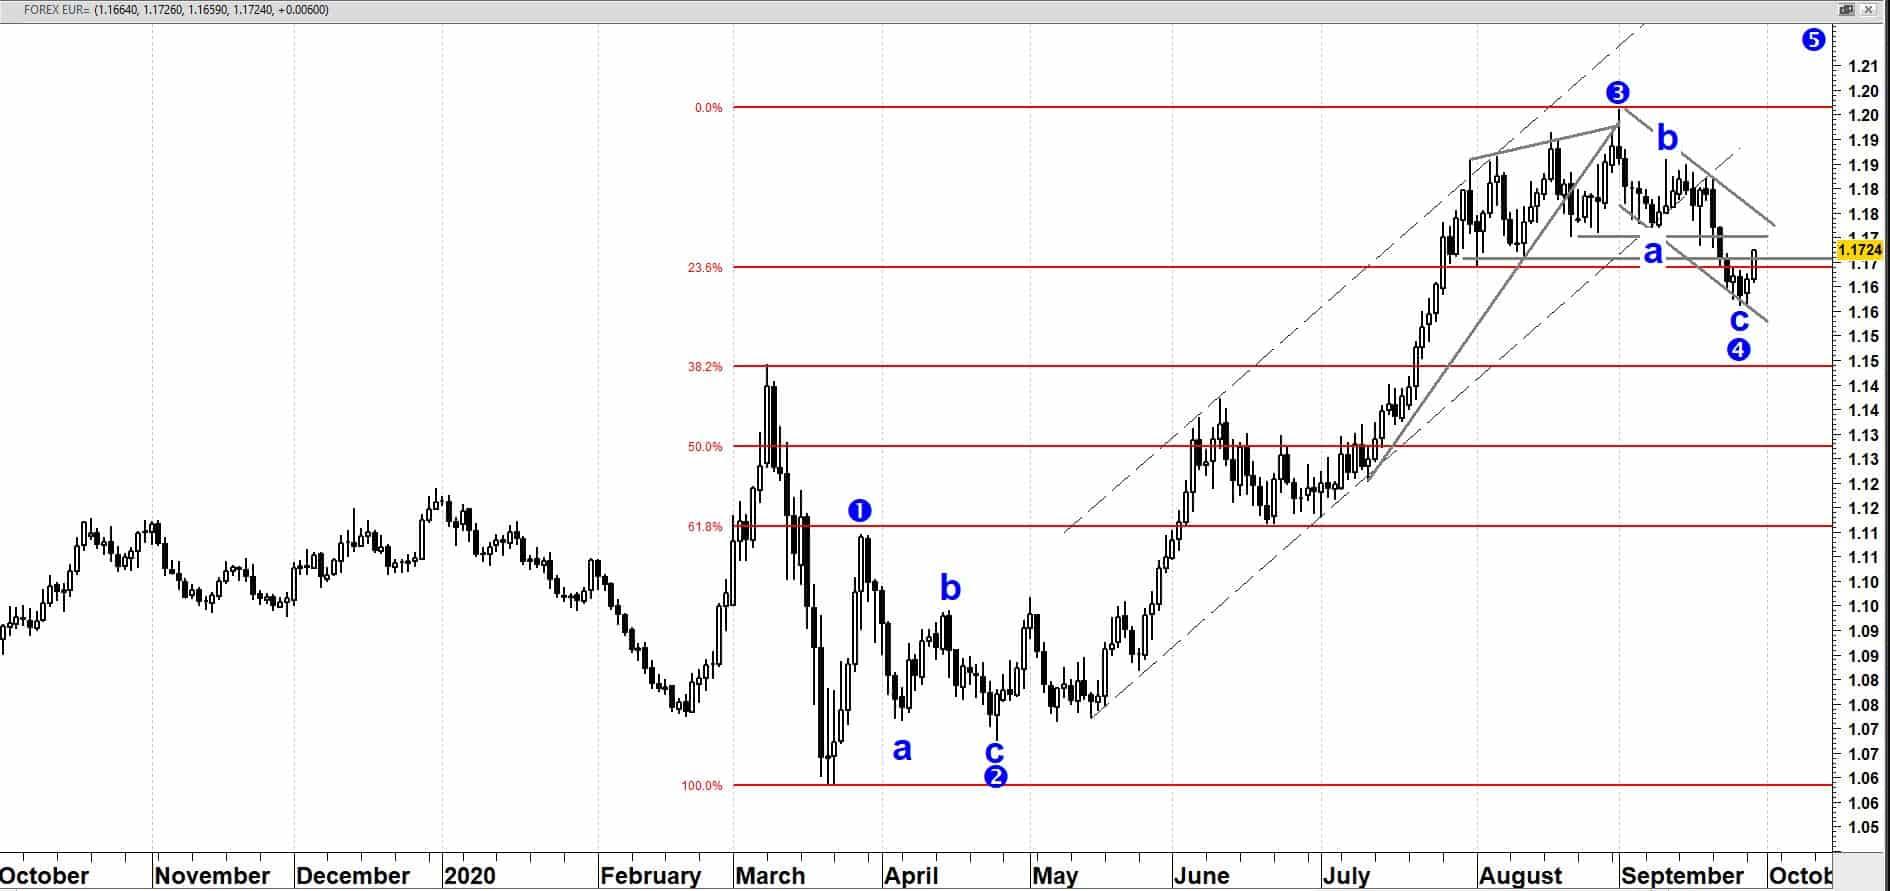 EUR/USD op dag basis vanaf oktober 2019 + Fibonacci-ratio's en Elliott Wave golventheorie